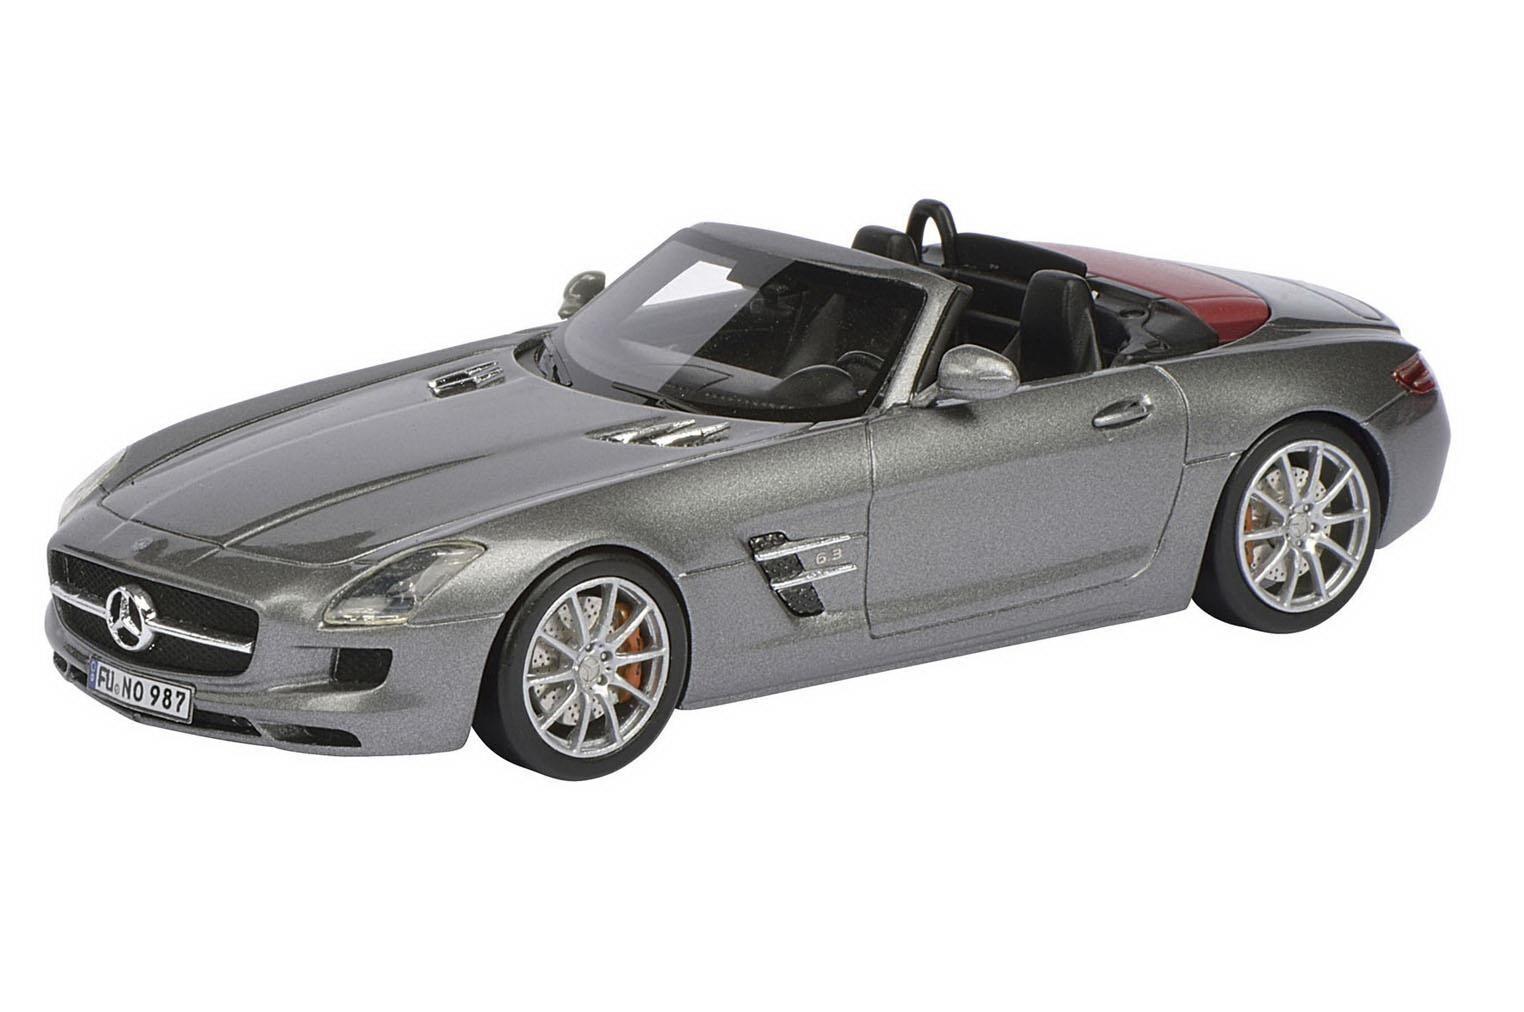 SCHUCO Mercedes-Benz SLS AMG  Roadster Monza gris 1 43 Dealer Nice  réductions incroyables